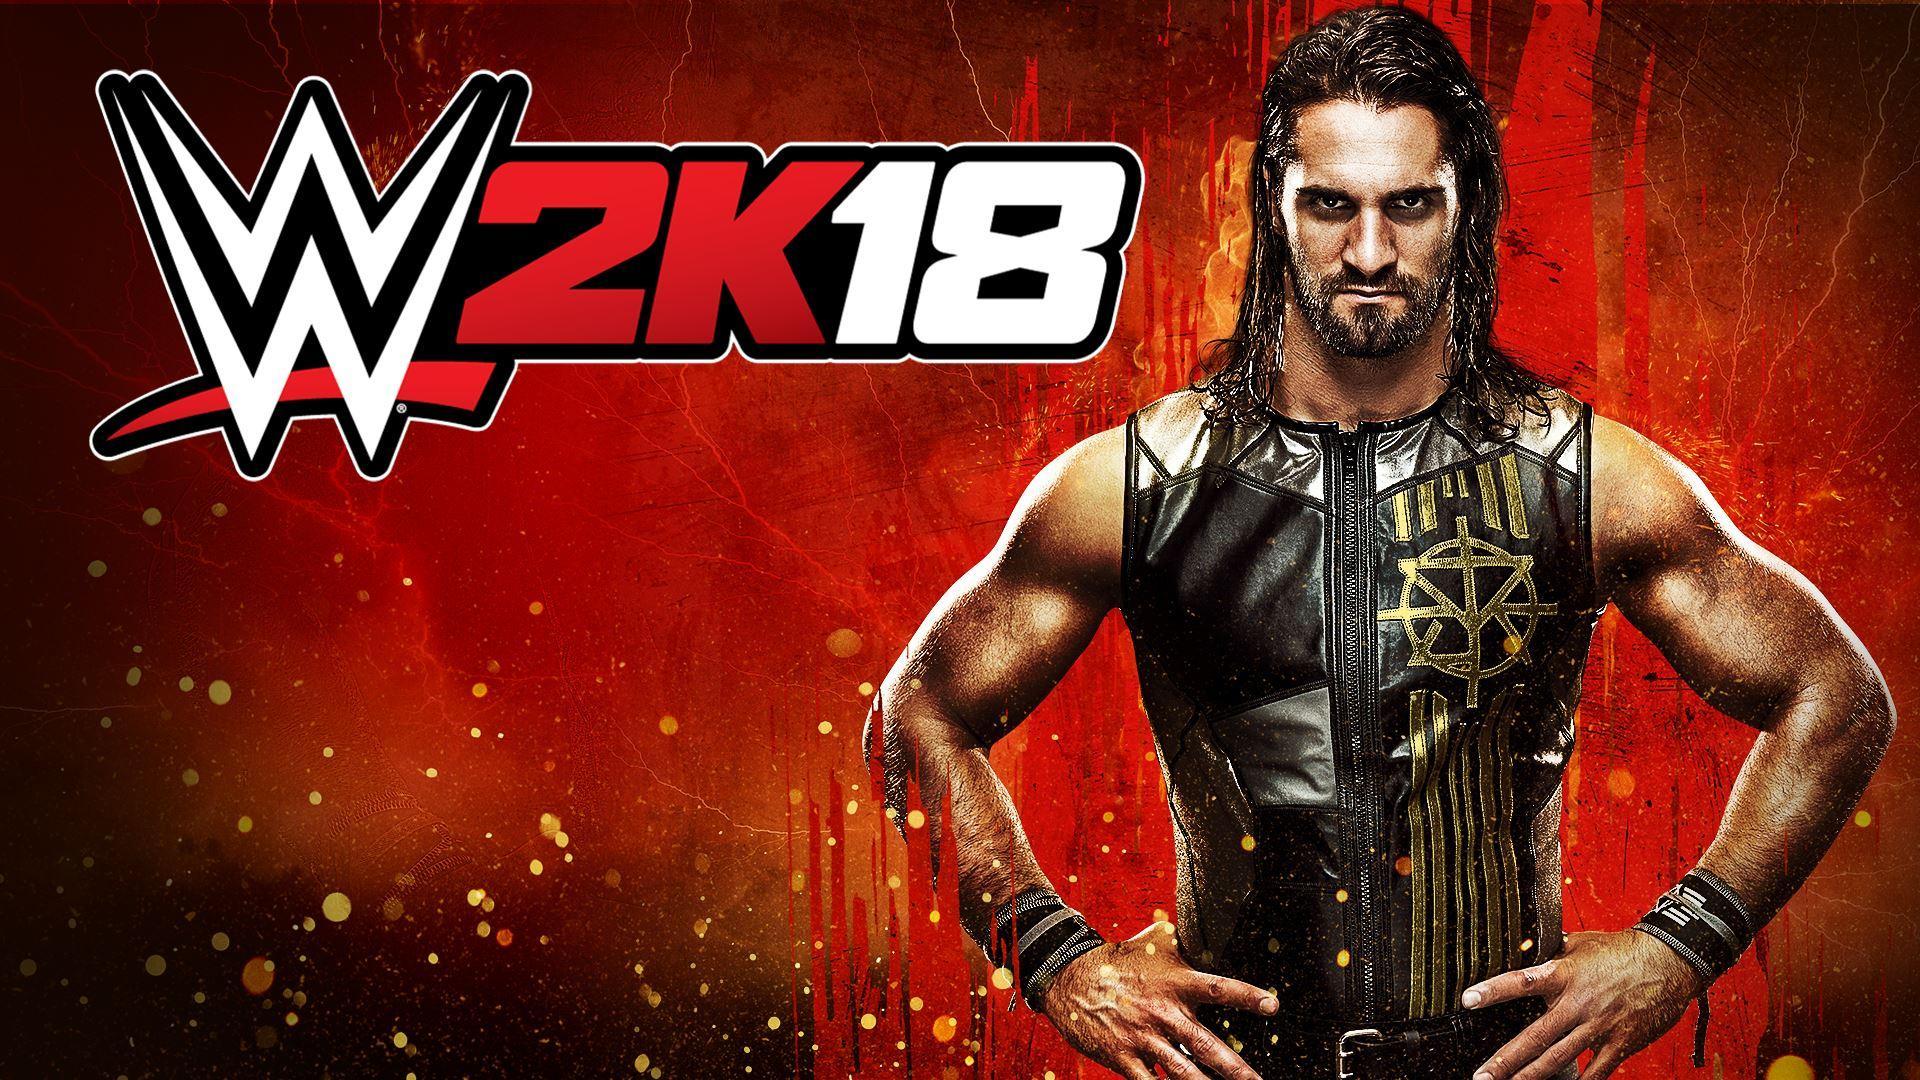 WWE 2K18 Wallpapers